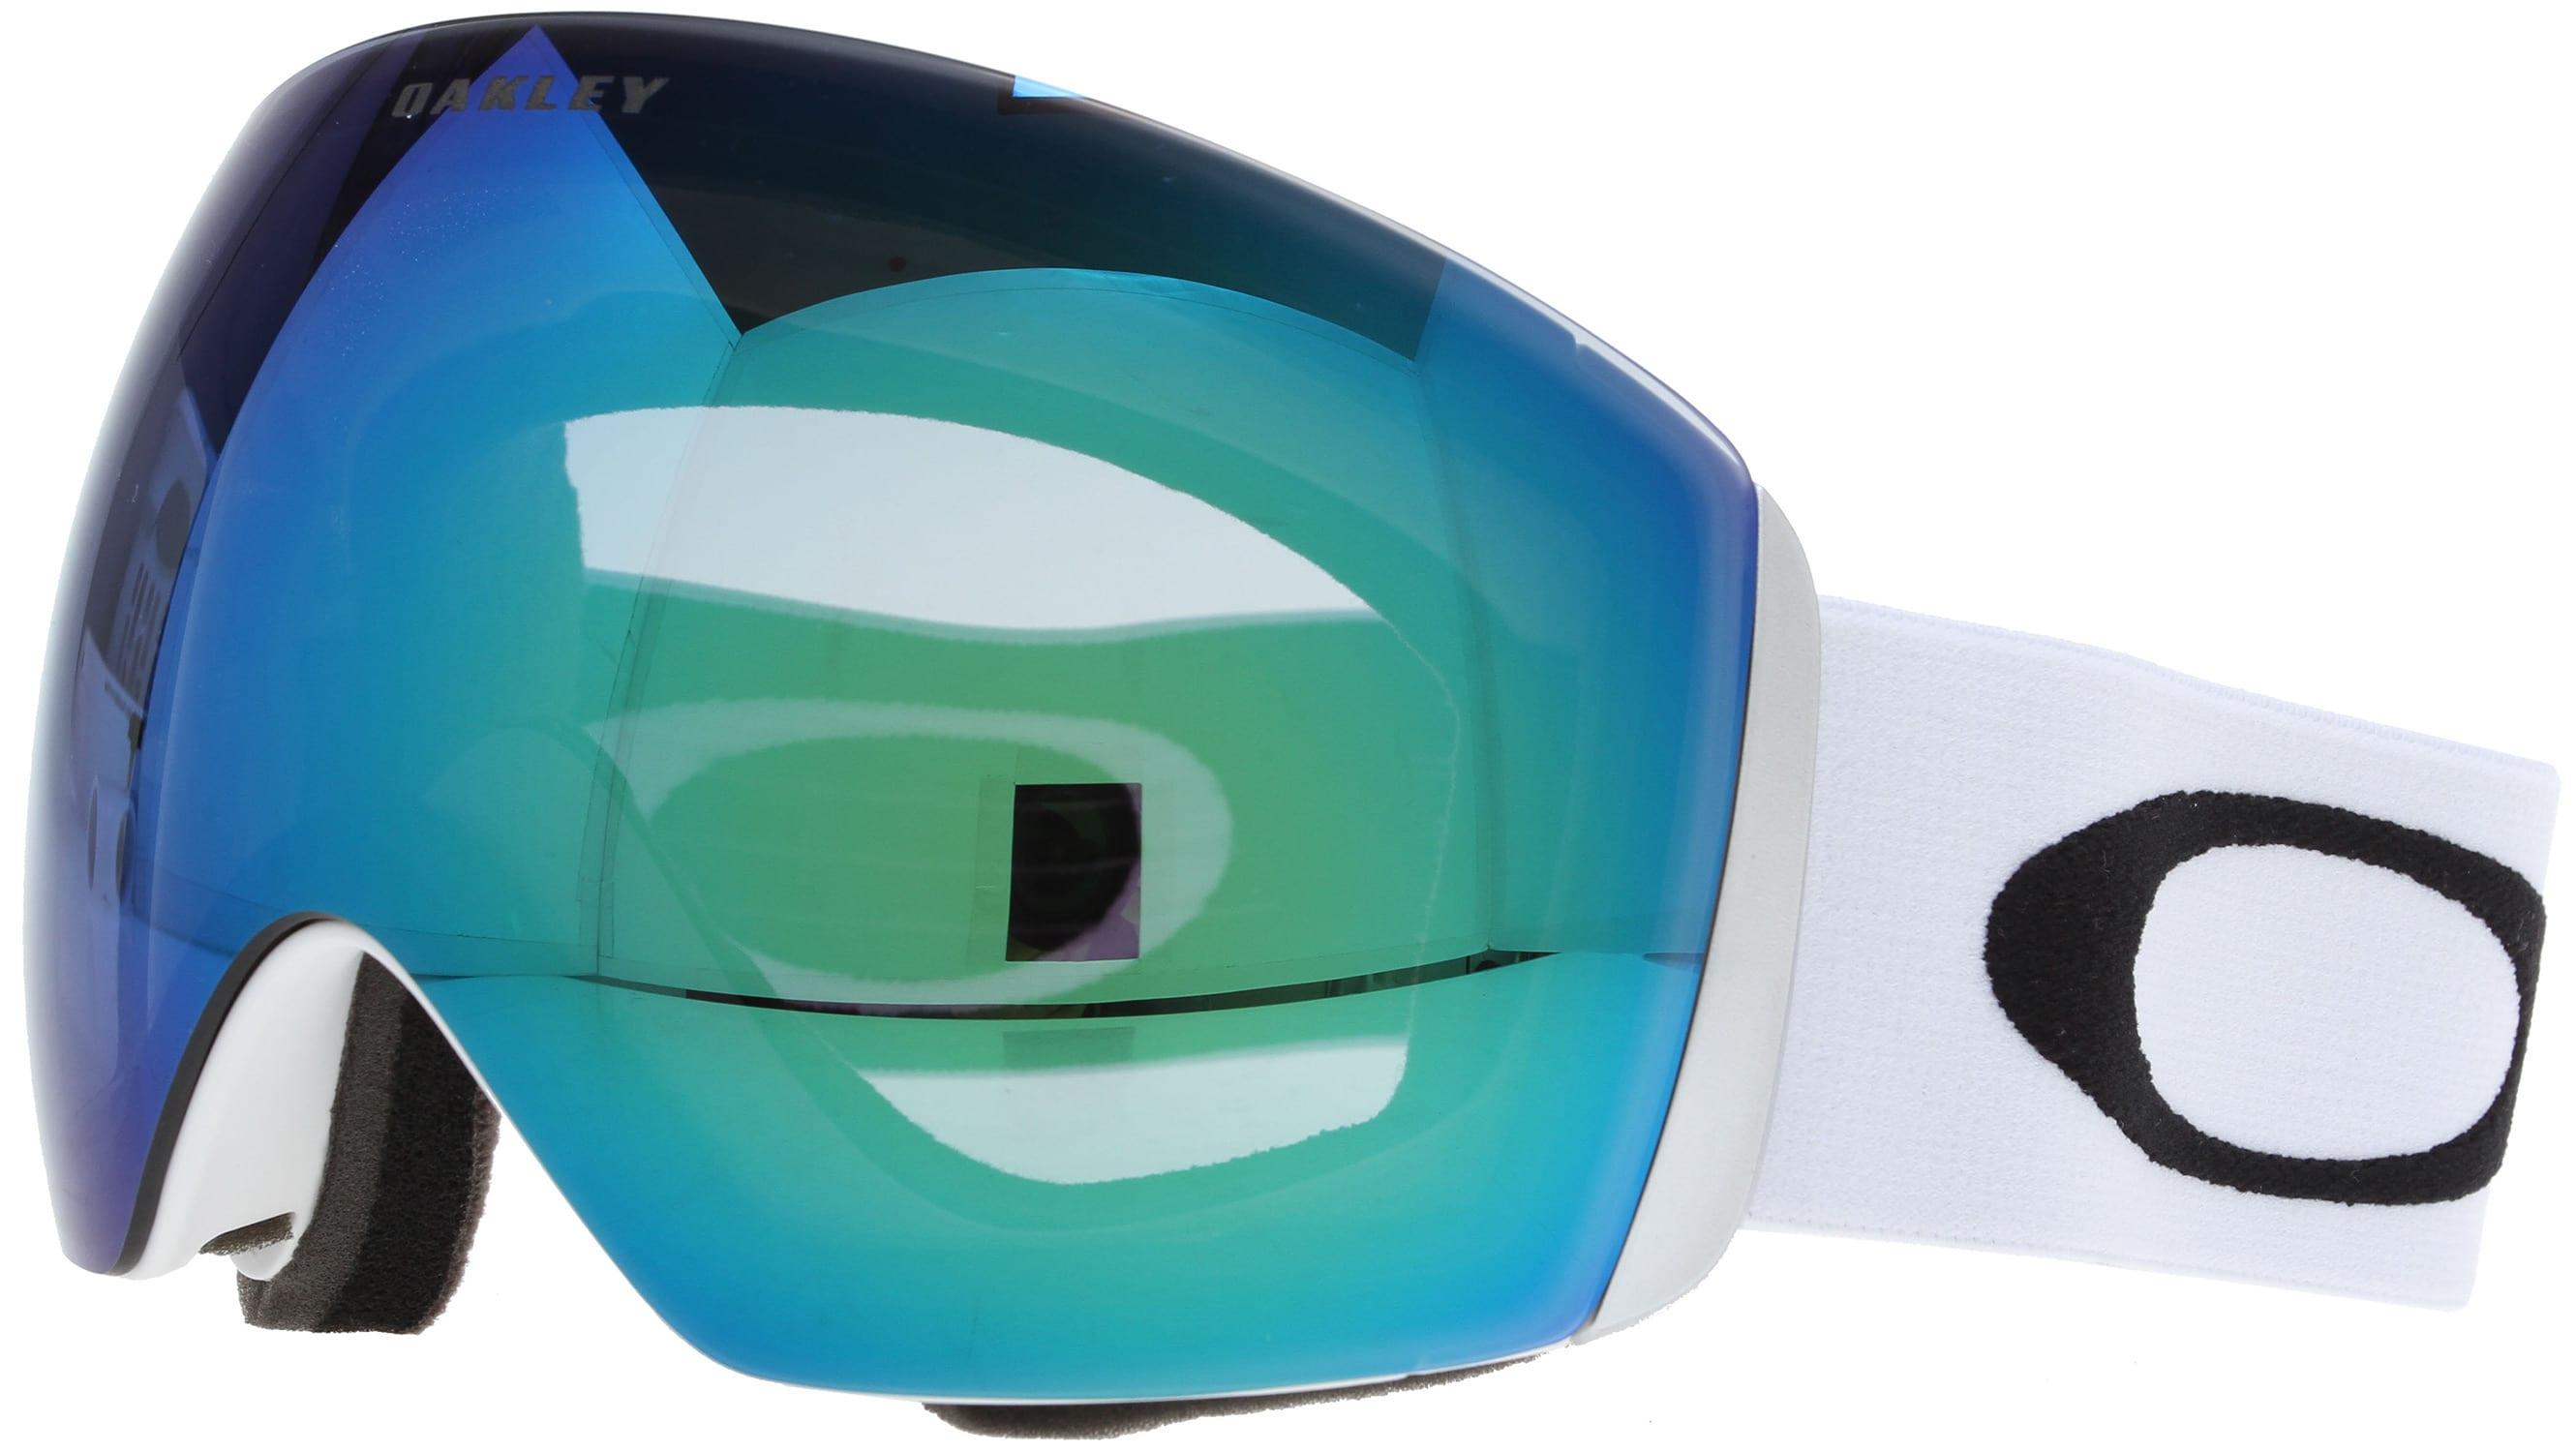 b18defcdbac9 Oakley Ski Goggles Size Chart « Heritage Malta